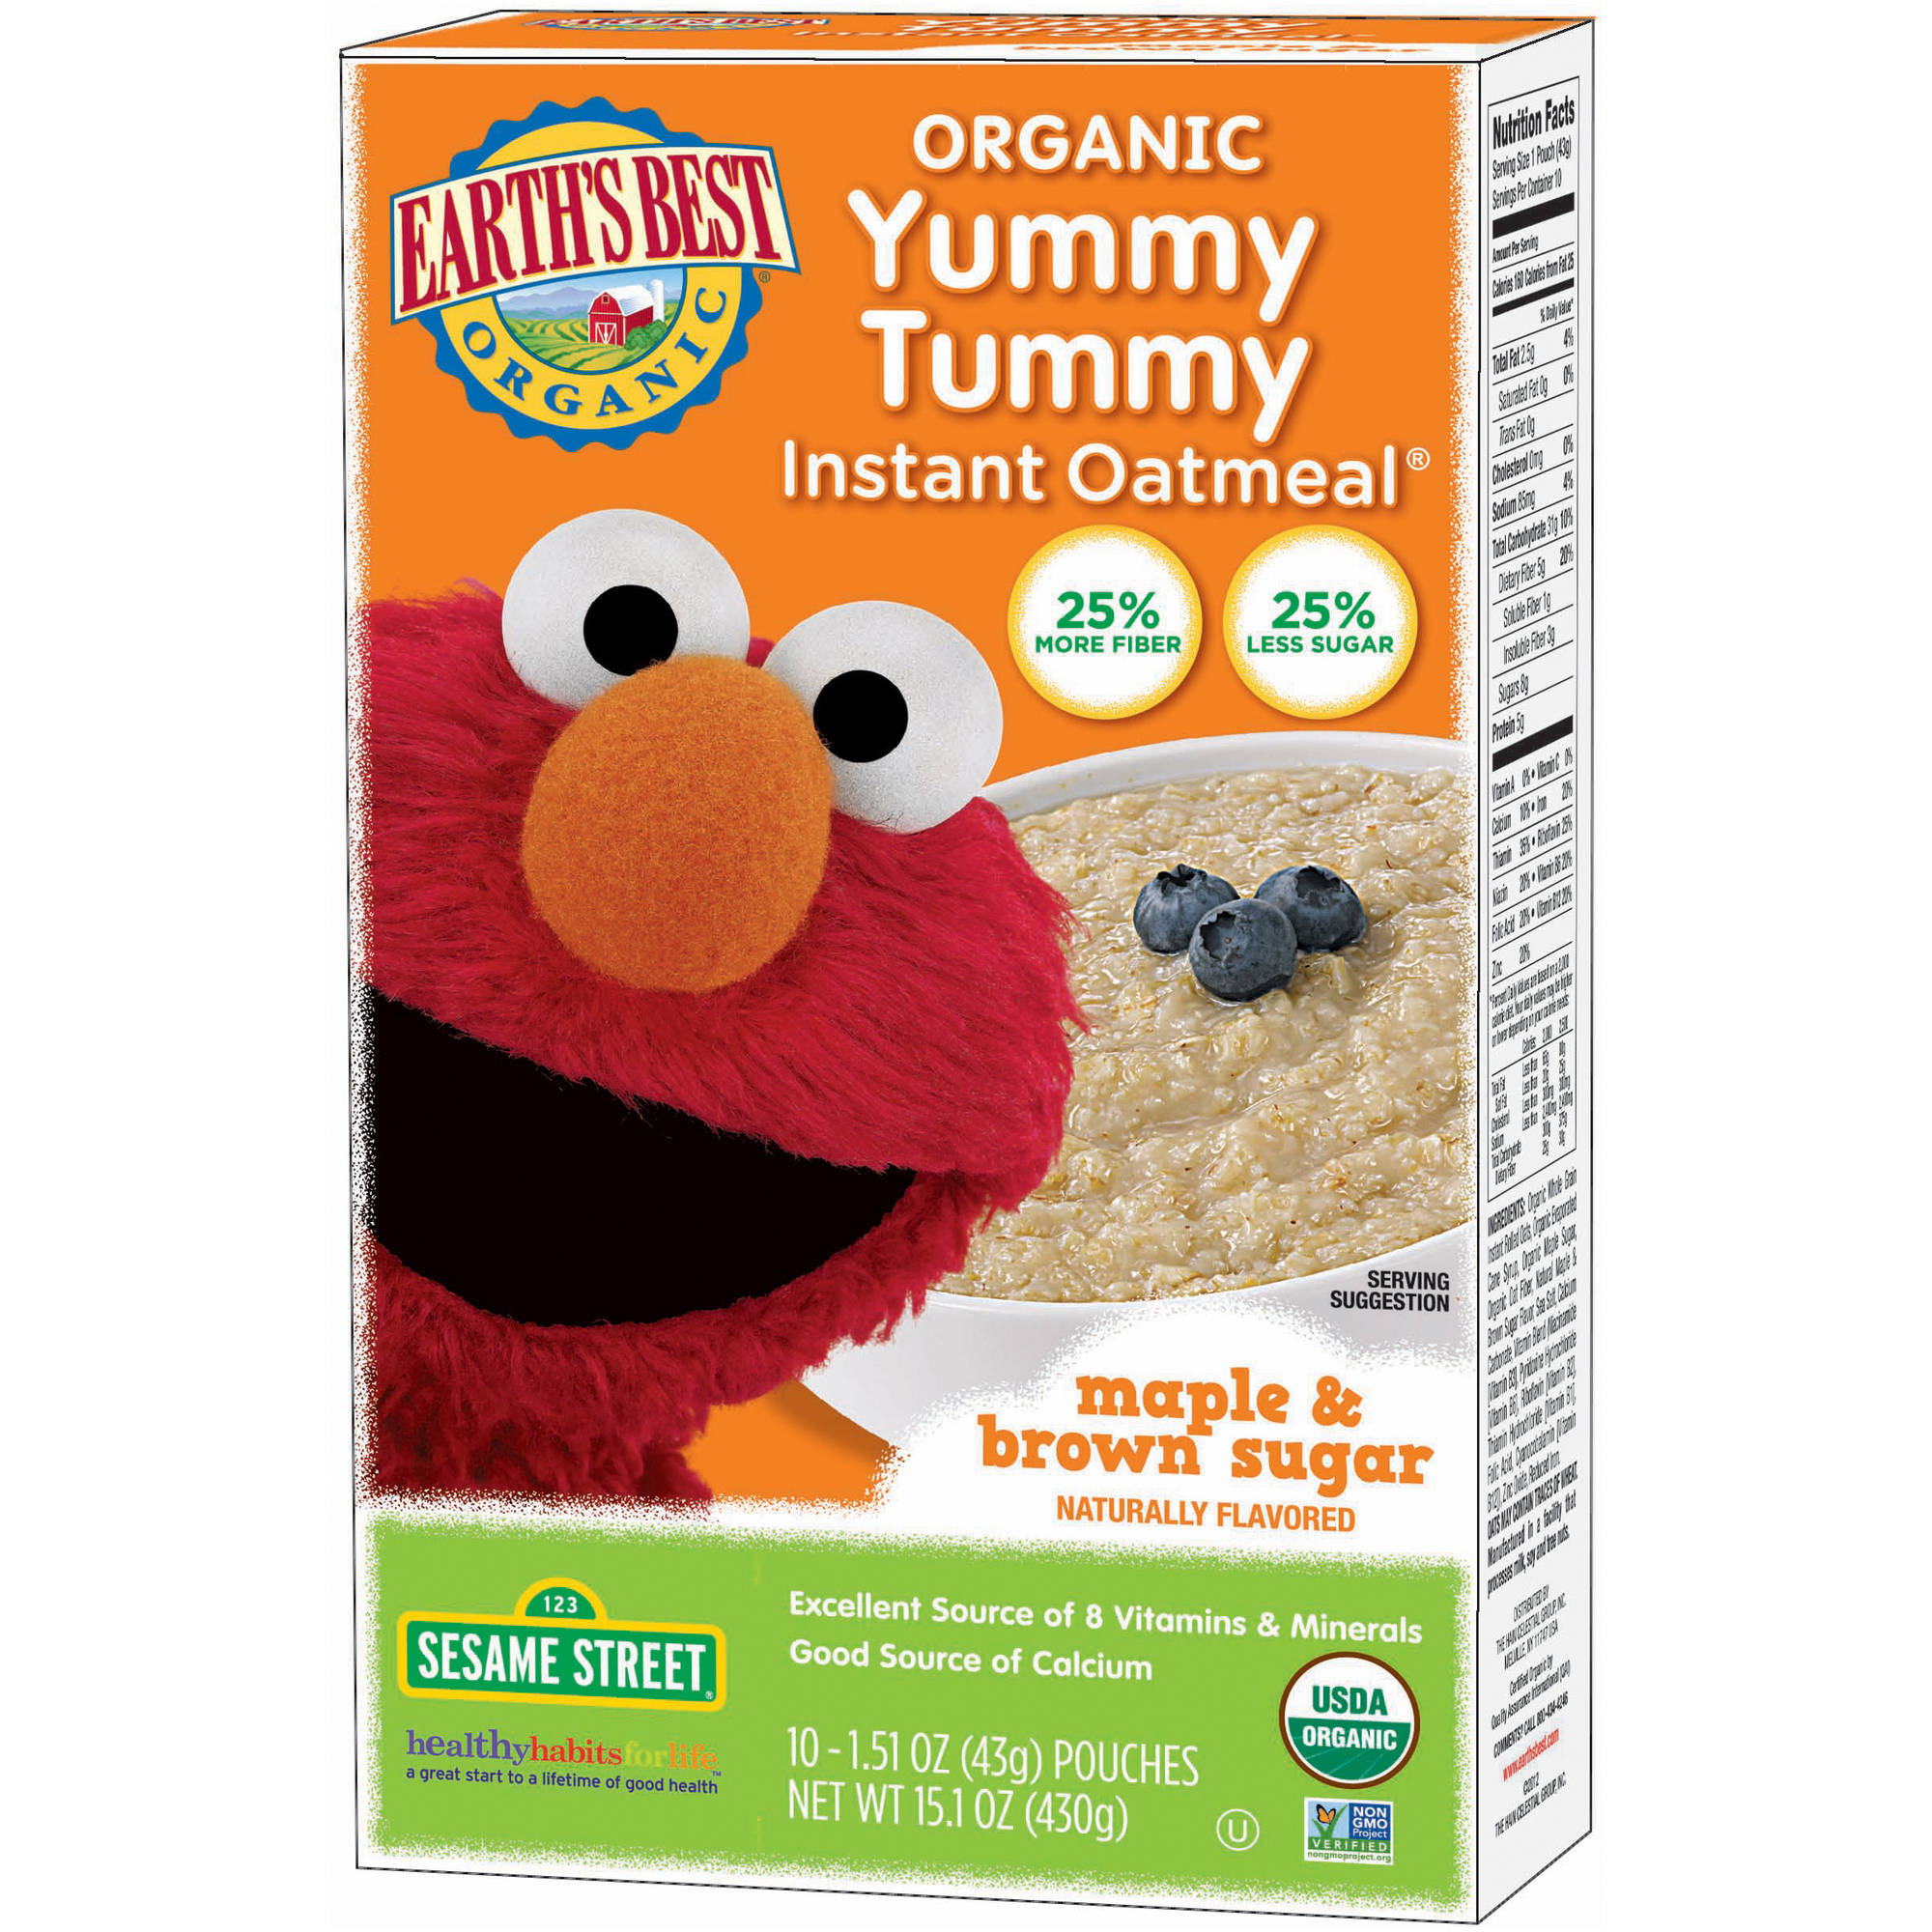 Earth's Best Sesame Street Yummy Tummy Organic  Maple & Brown Sugar Instant Oatmeal, 1.51 oz, 10 count